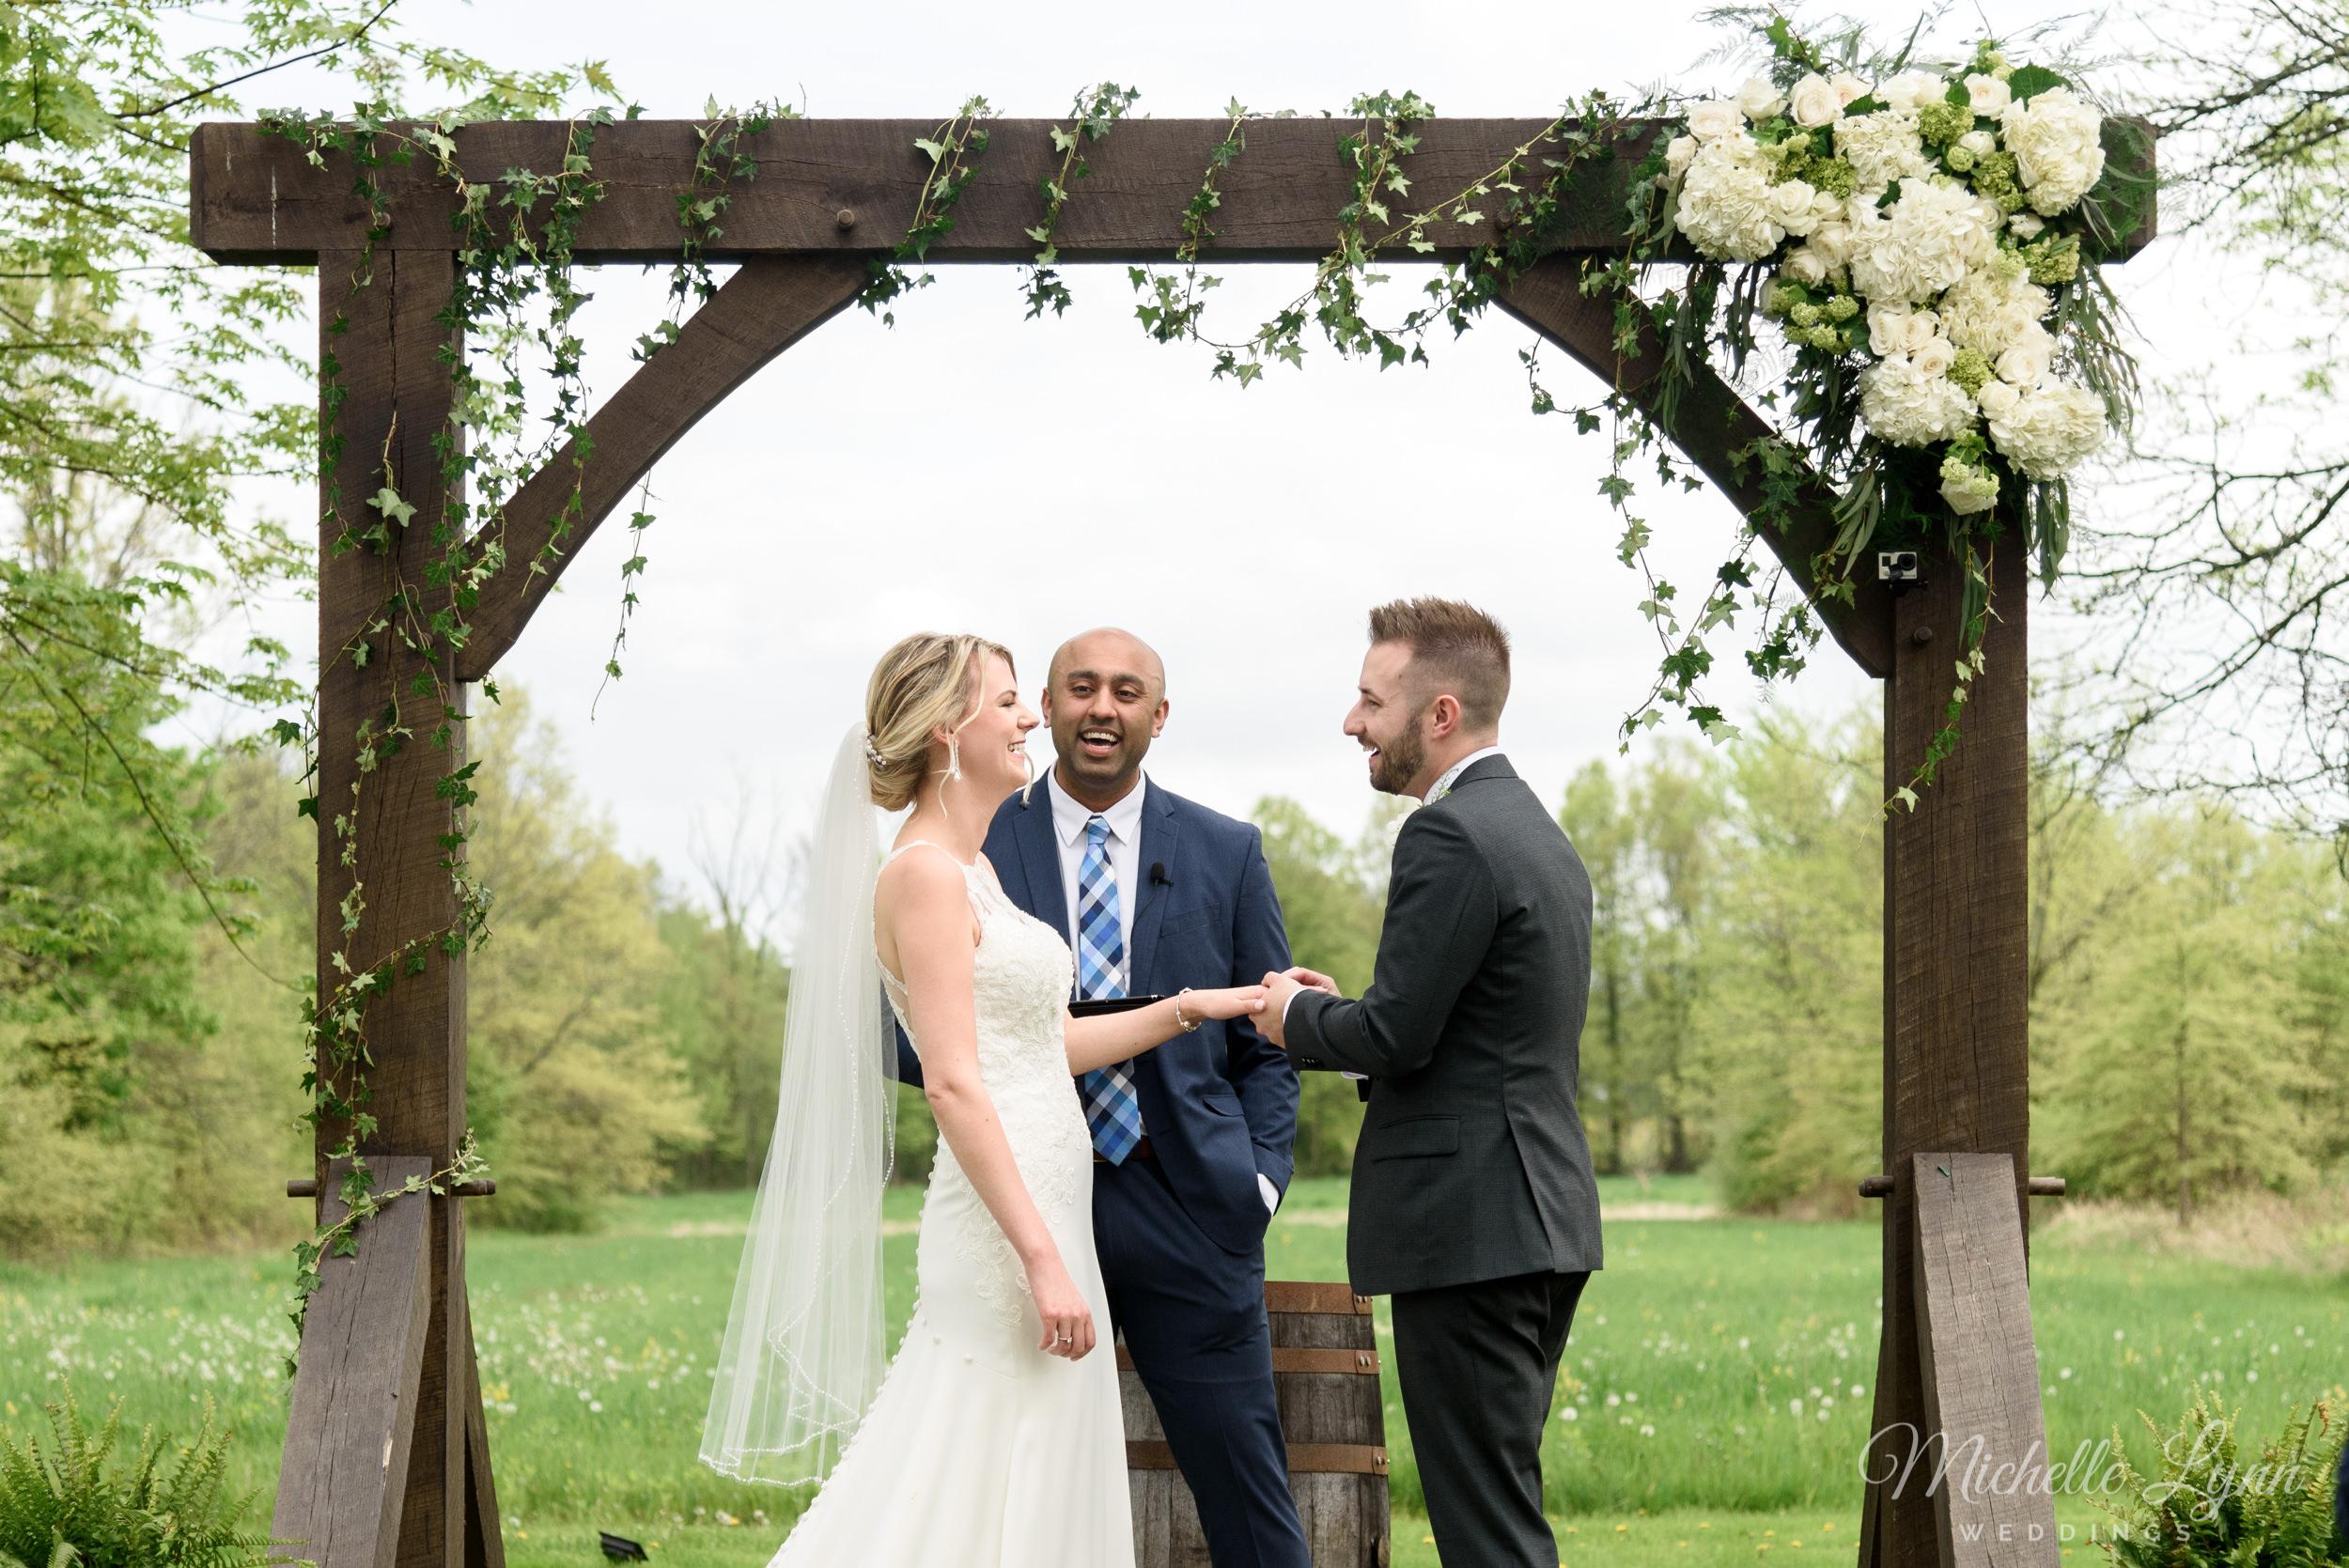 mlw-the-farm-bakery-and-events-wedding-photos-43.jpg